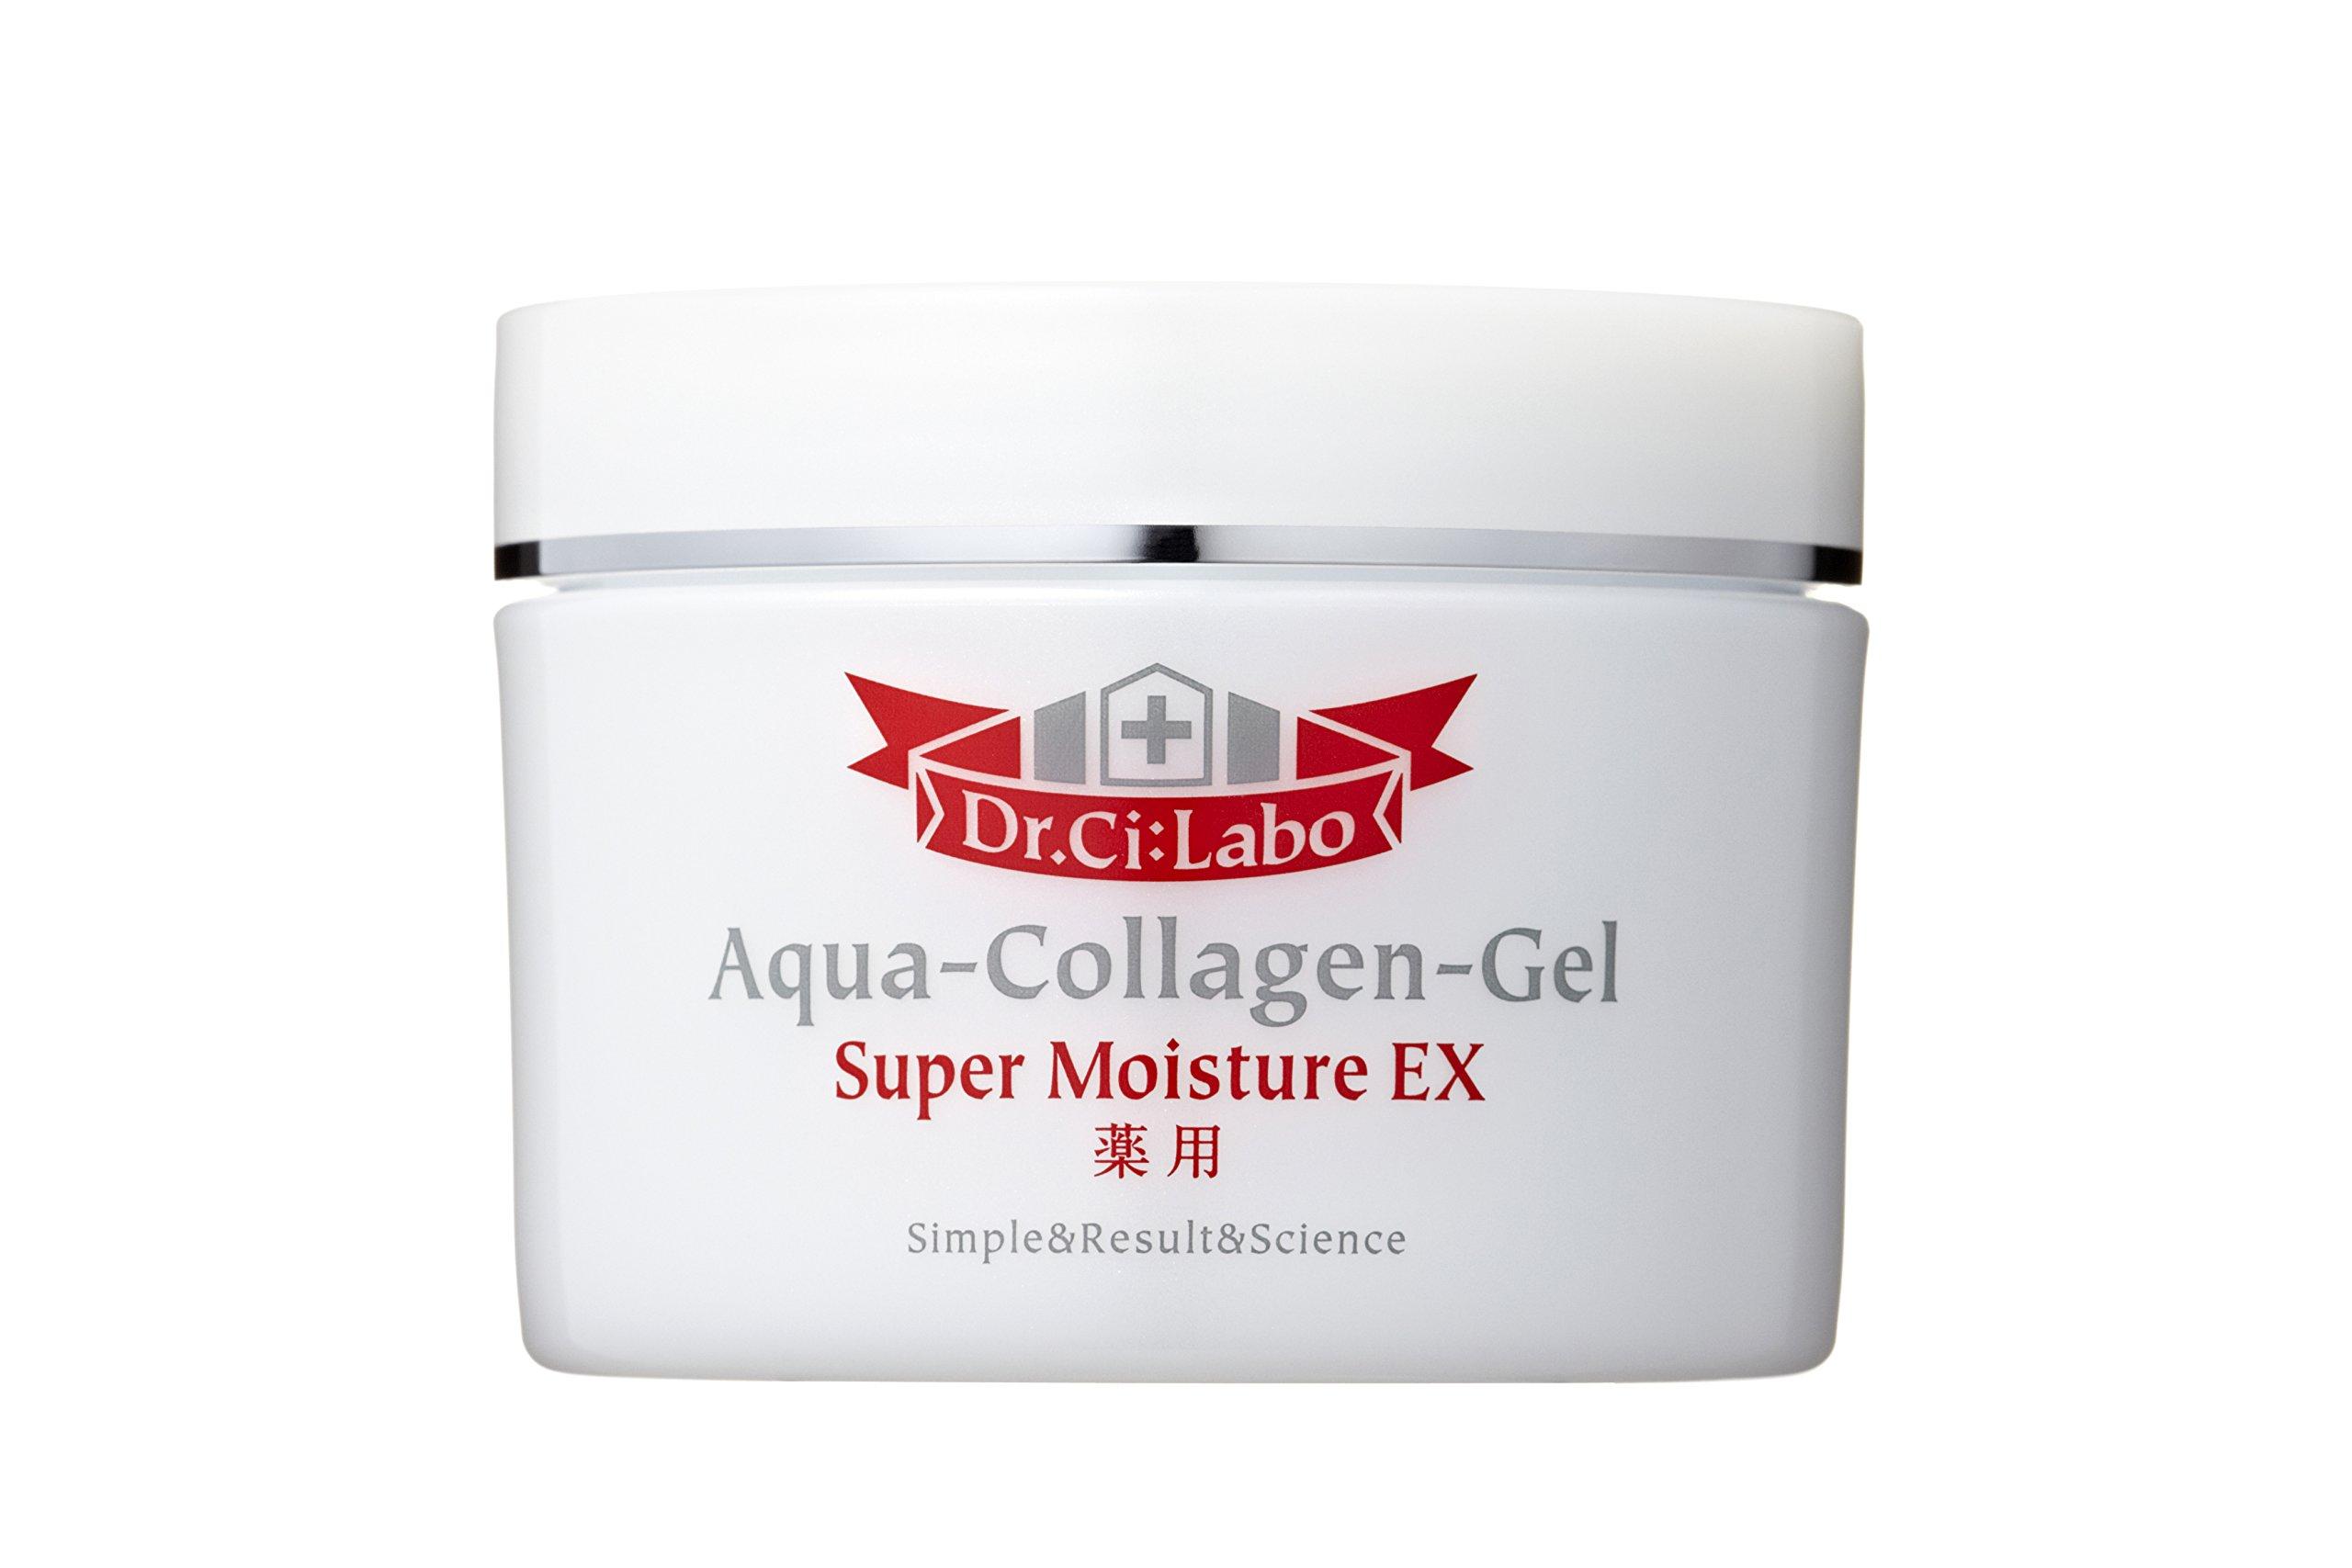 Dr.Ci Labo Japanese Skin Care Medicated Aqua-Collagen-Gel Super Moisture EX 200g by Dokutashirabo